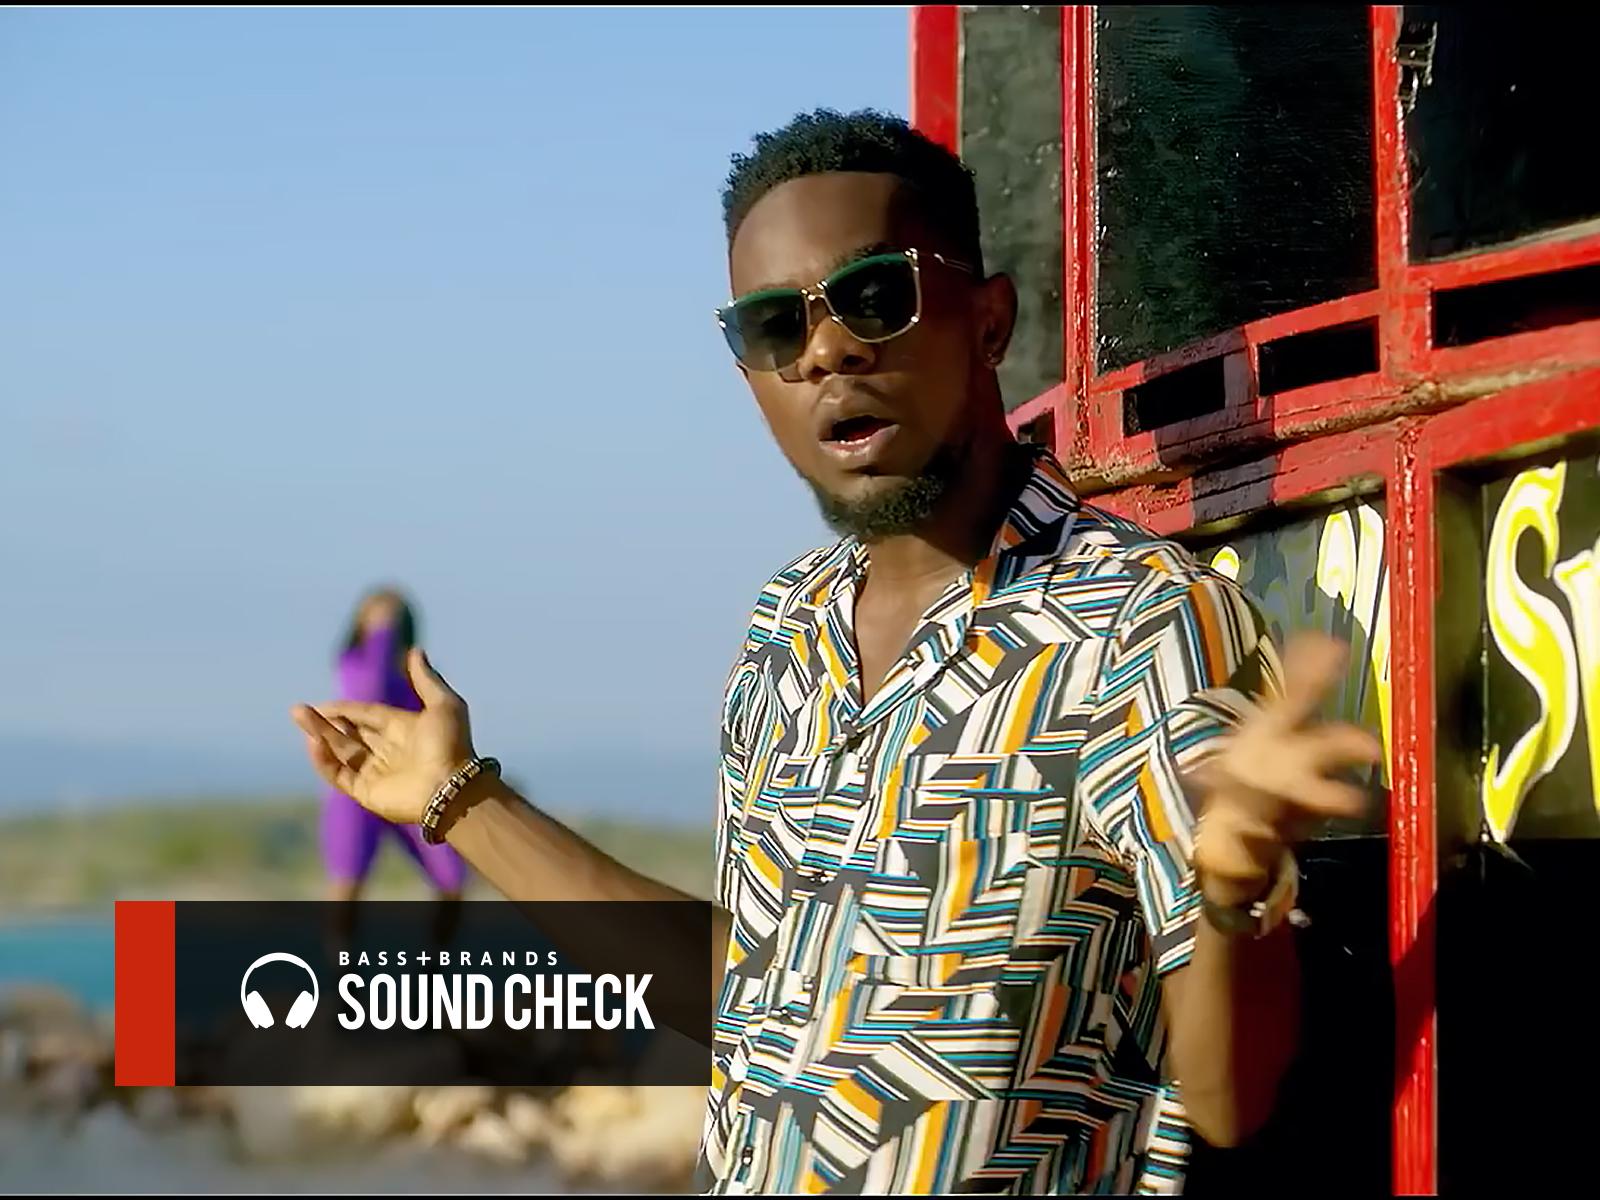 SOUND CHECK: Patoranking (NIGERIA) – Bass + Brands Blog